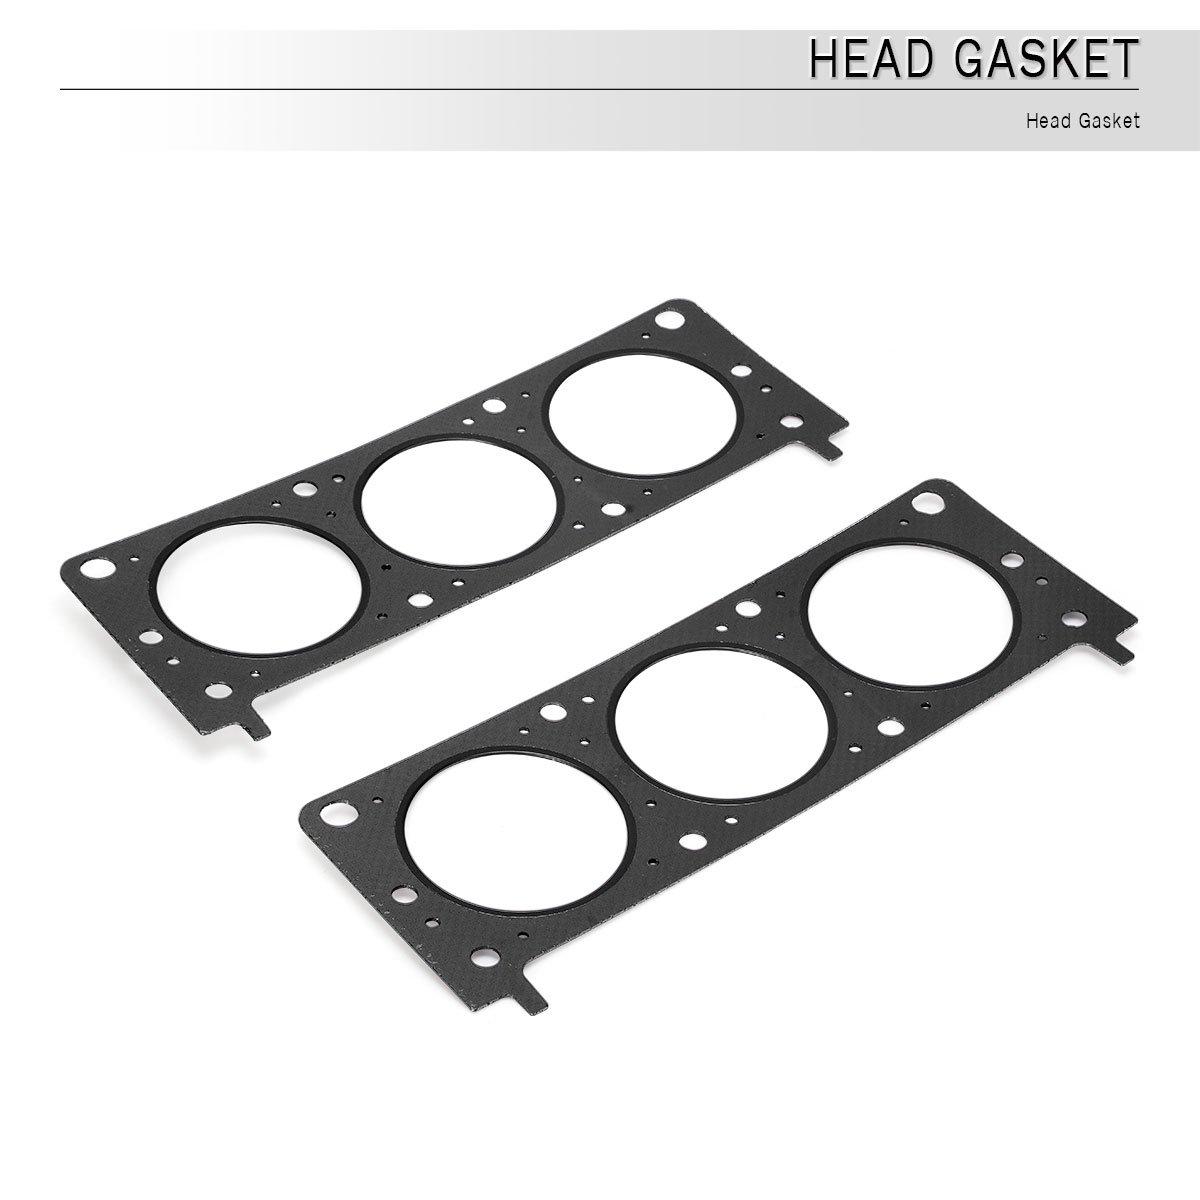 Amazon.com: Cylinder Head Gasket Set, YITAMOTOR Head Bolts Compatible for  Chevrolet Pontiac 3.1L 3.4L V6 OHV VIN F, HS9071PT: Automotive